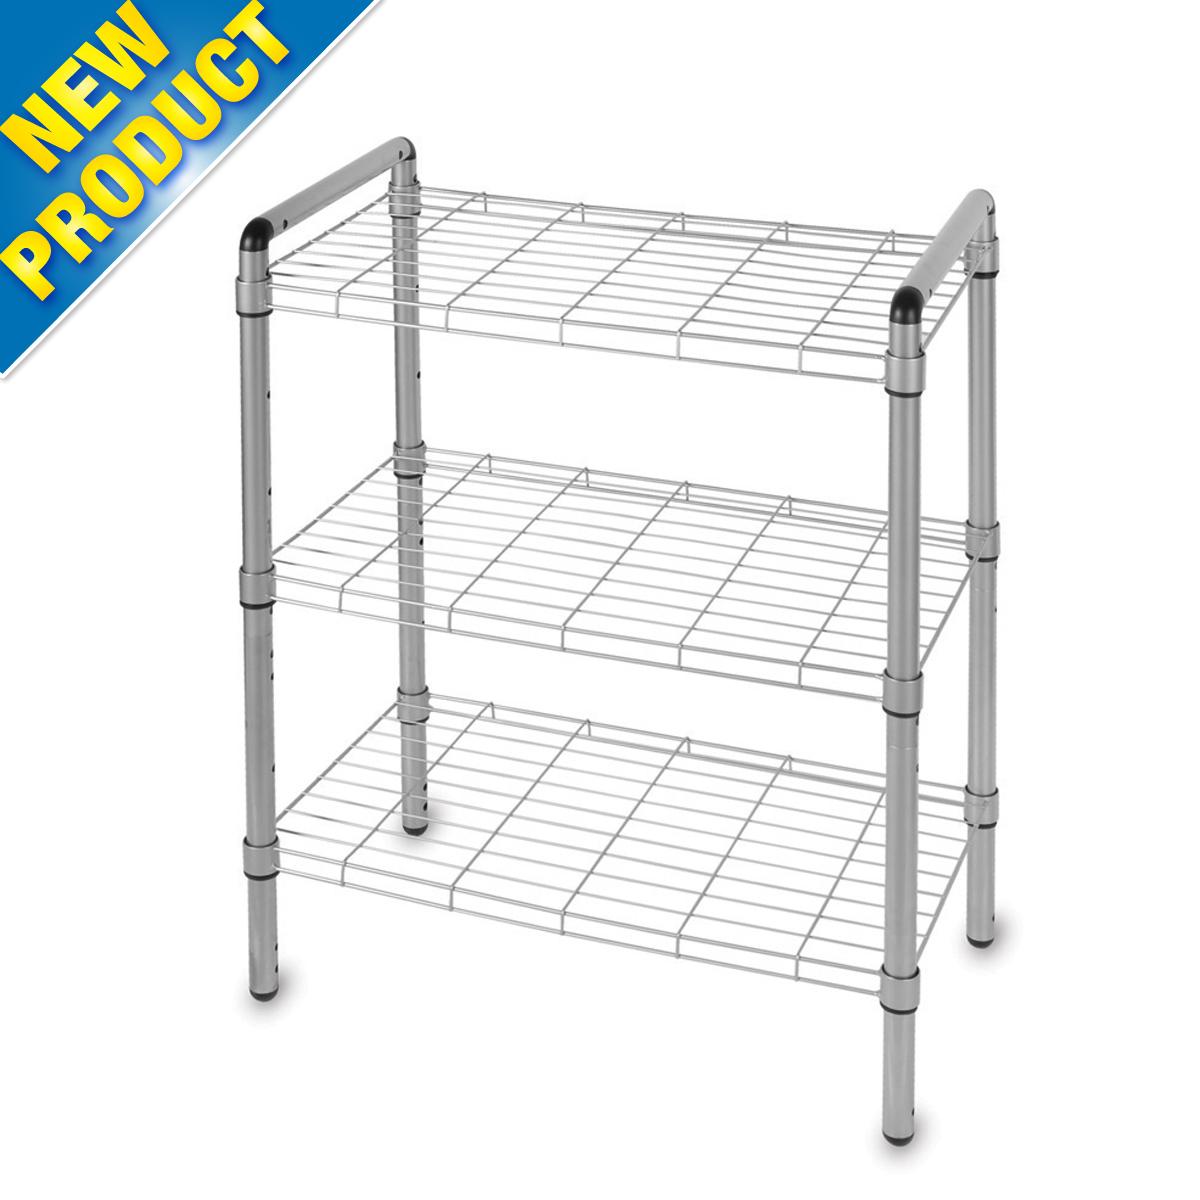 Silver Wire Home Storage Kitchen Closet Utility Rack Shelving 30